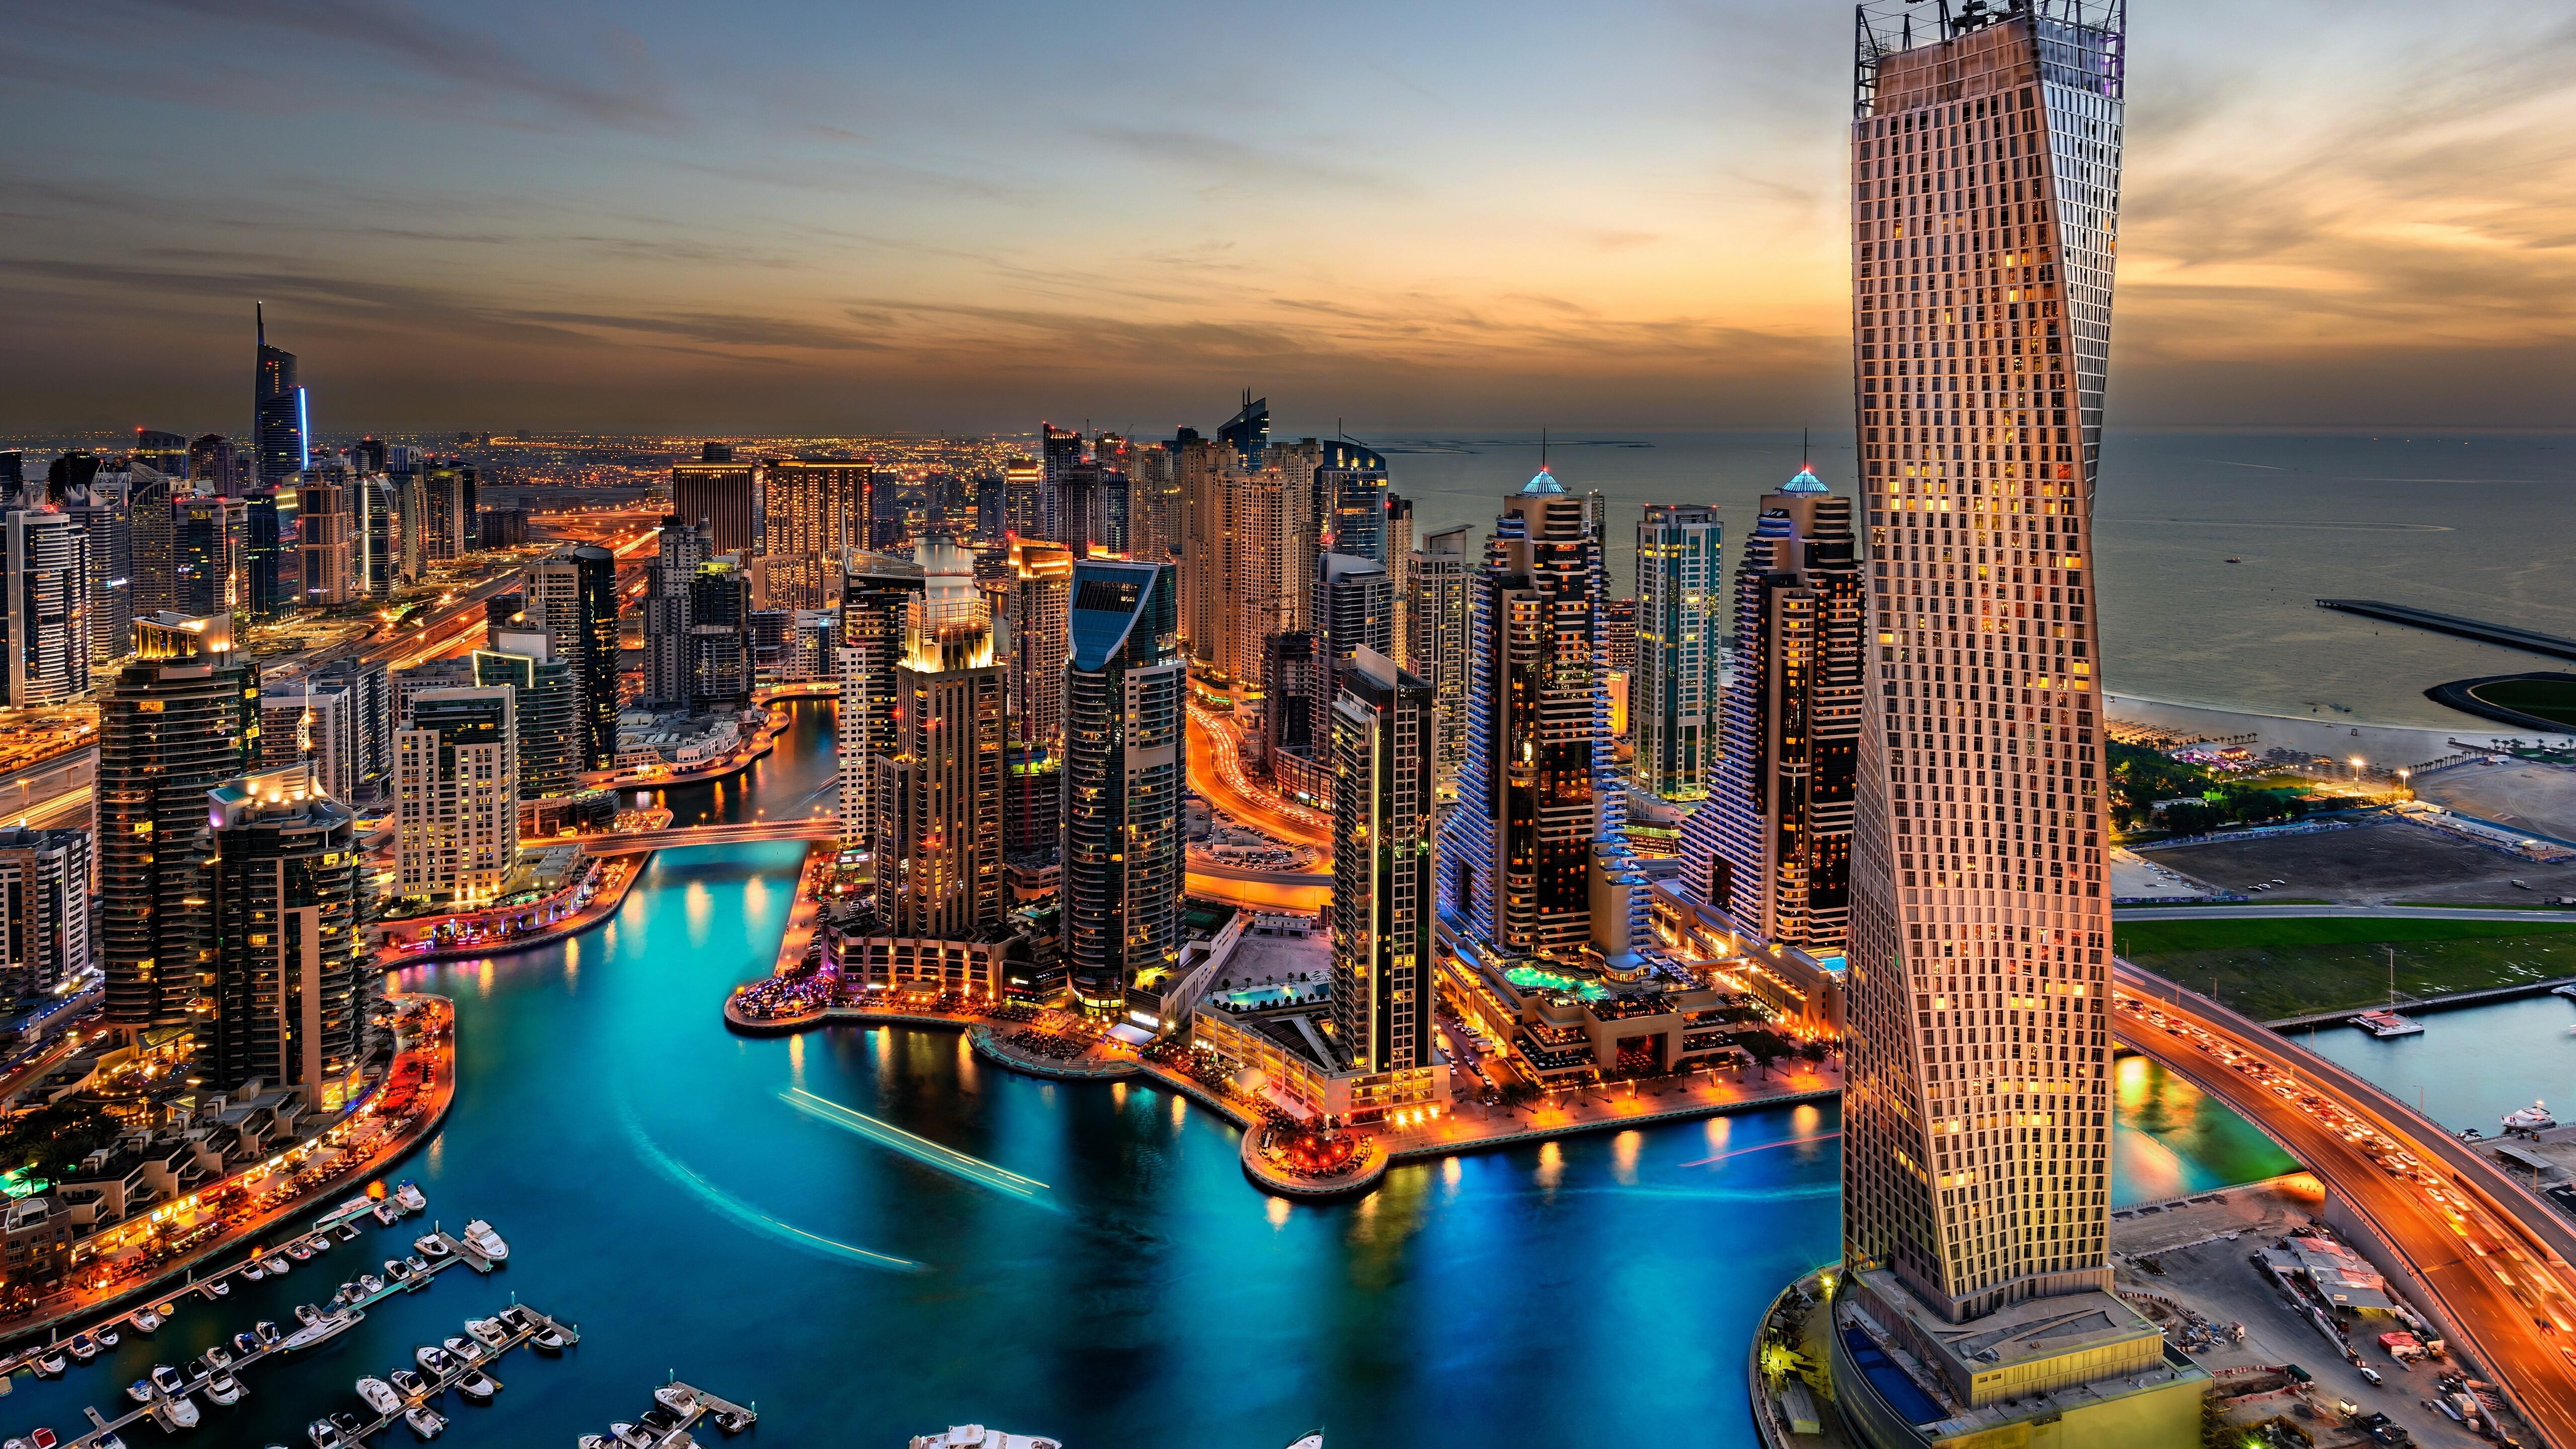 5120x2880 Dubai Uae Building Skyscrappers Night 5k Hd 4k Wallpapers